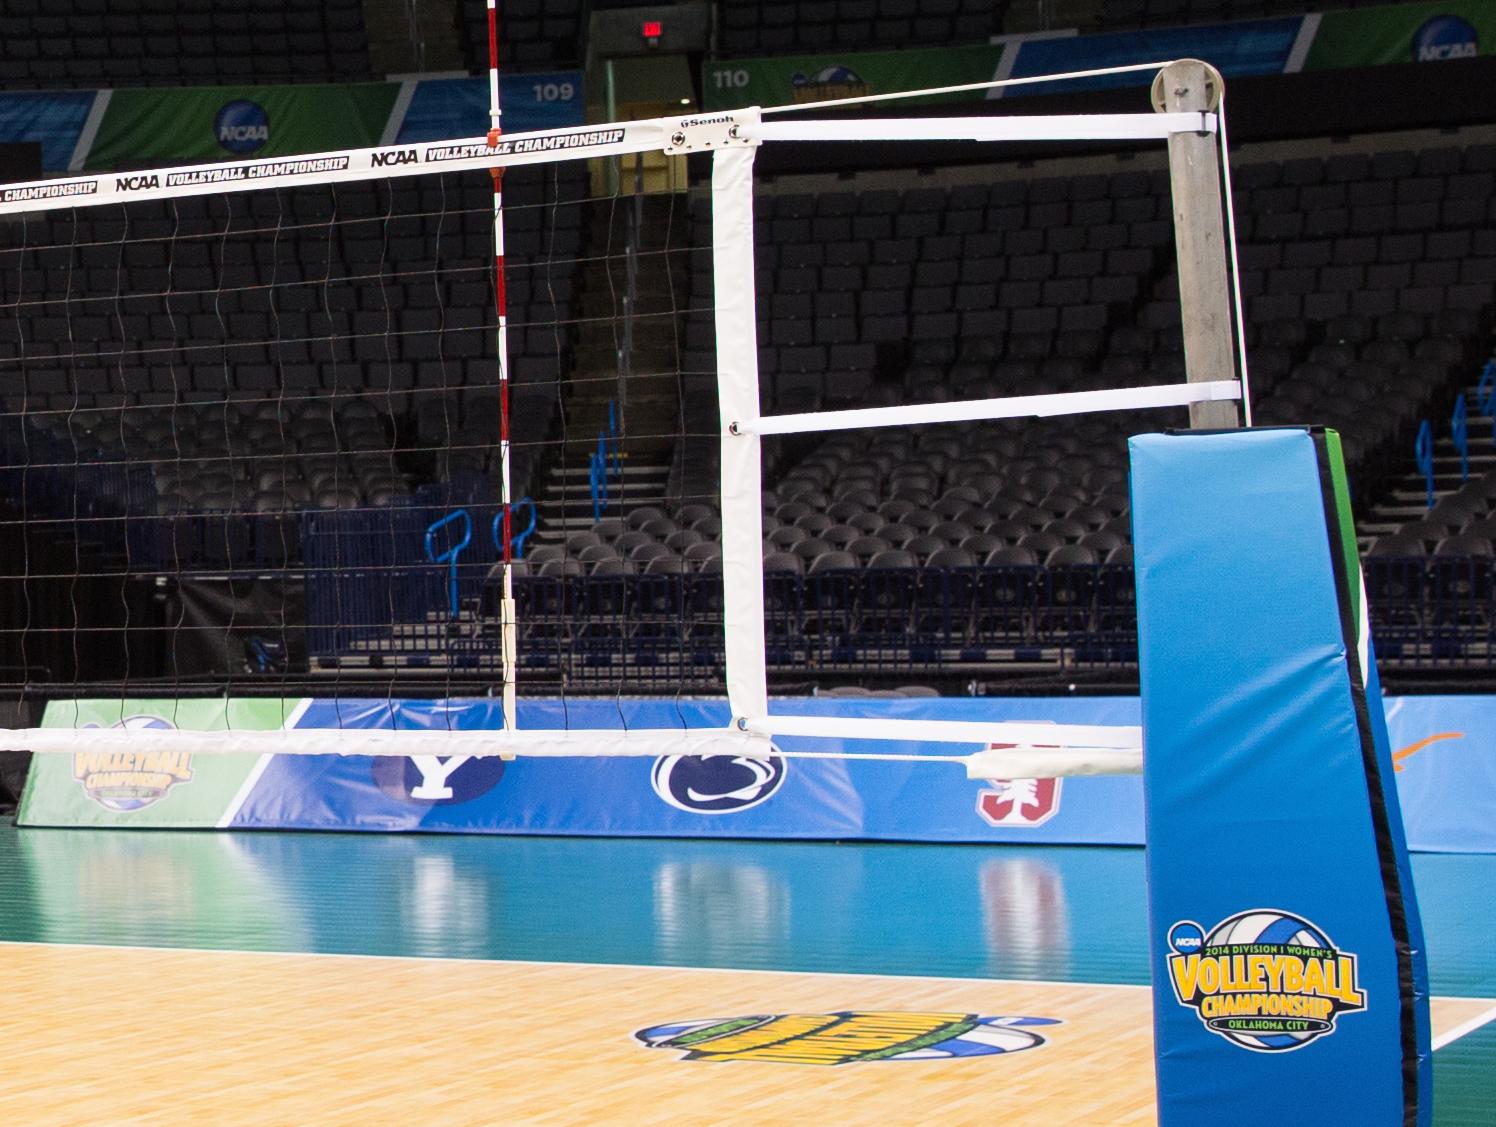 Professional Senoh Volleyball Net